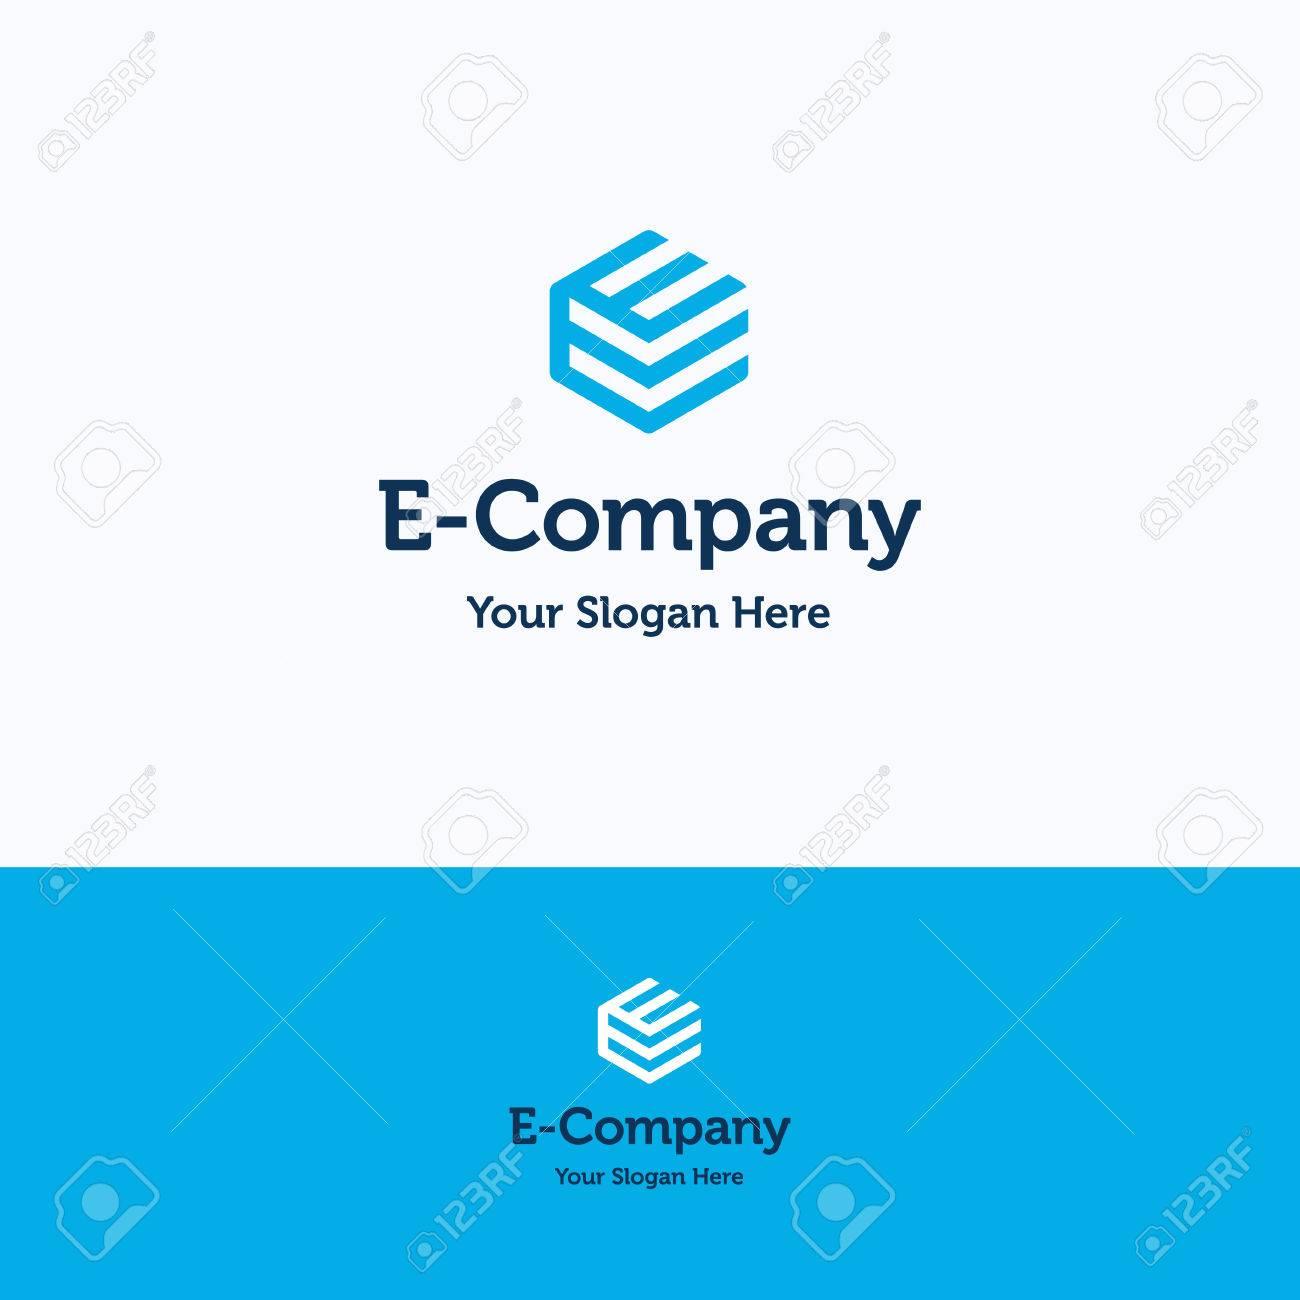 Leggere pubblico Stereotipo  Hexagon 3D Cube E Letter Logo Royalty Free Cliparts, Vectors, And ...